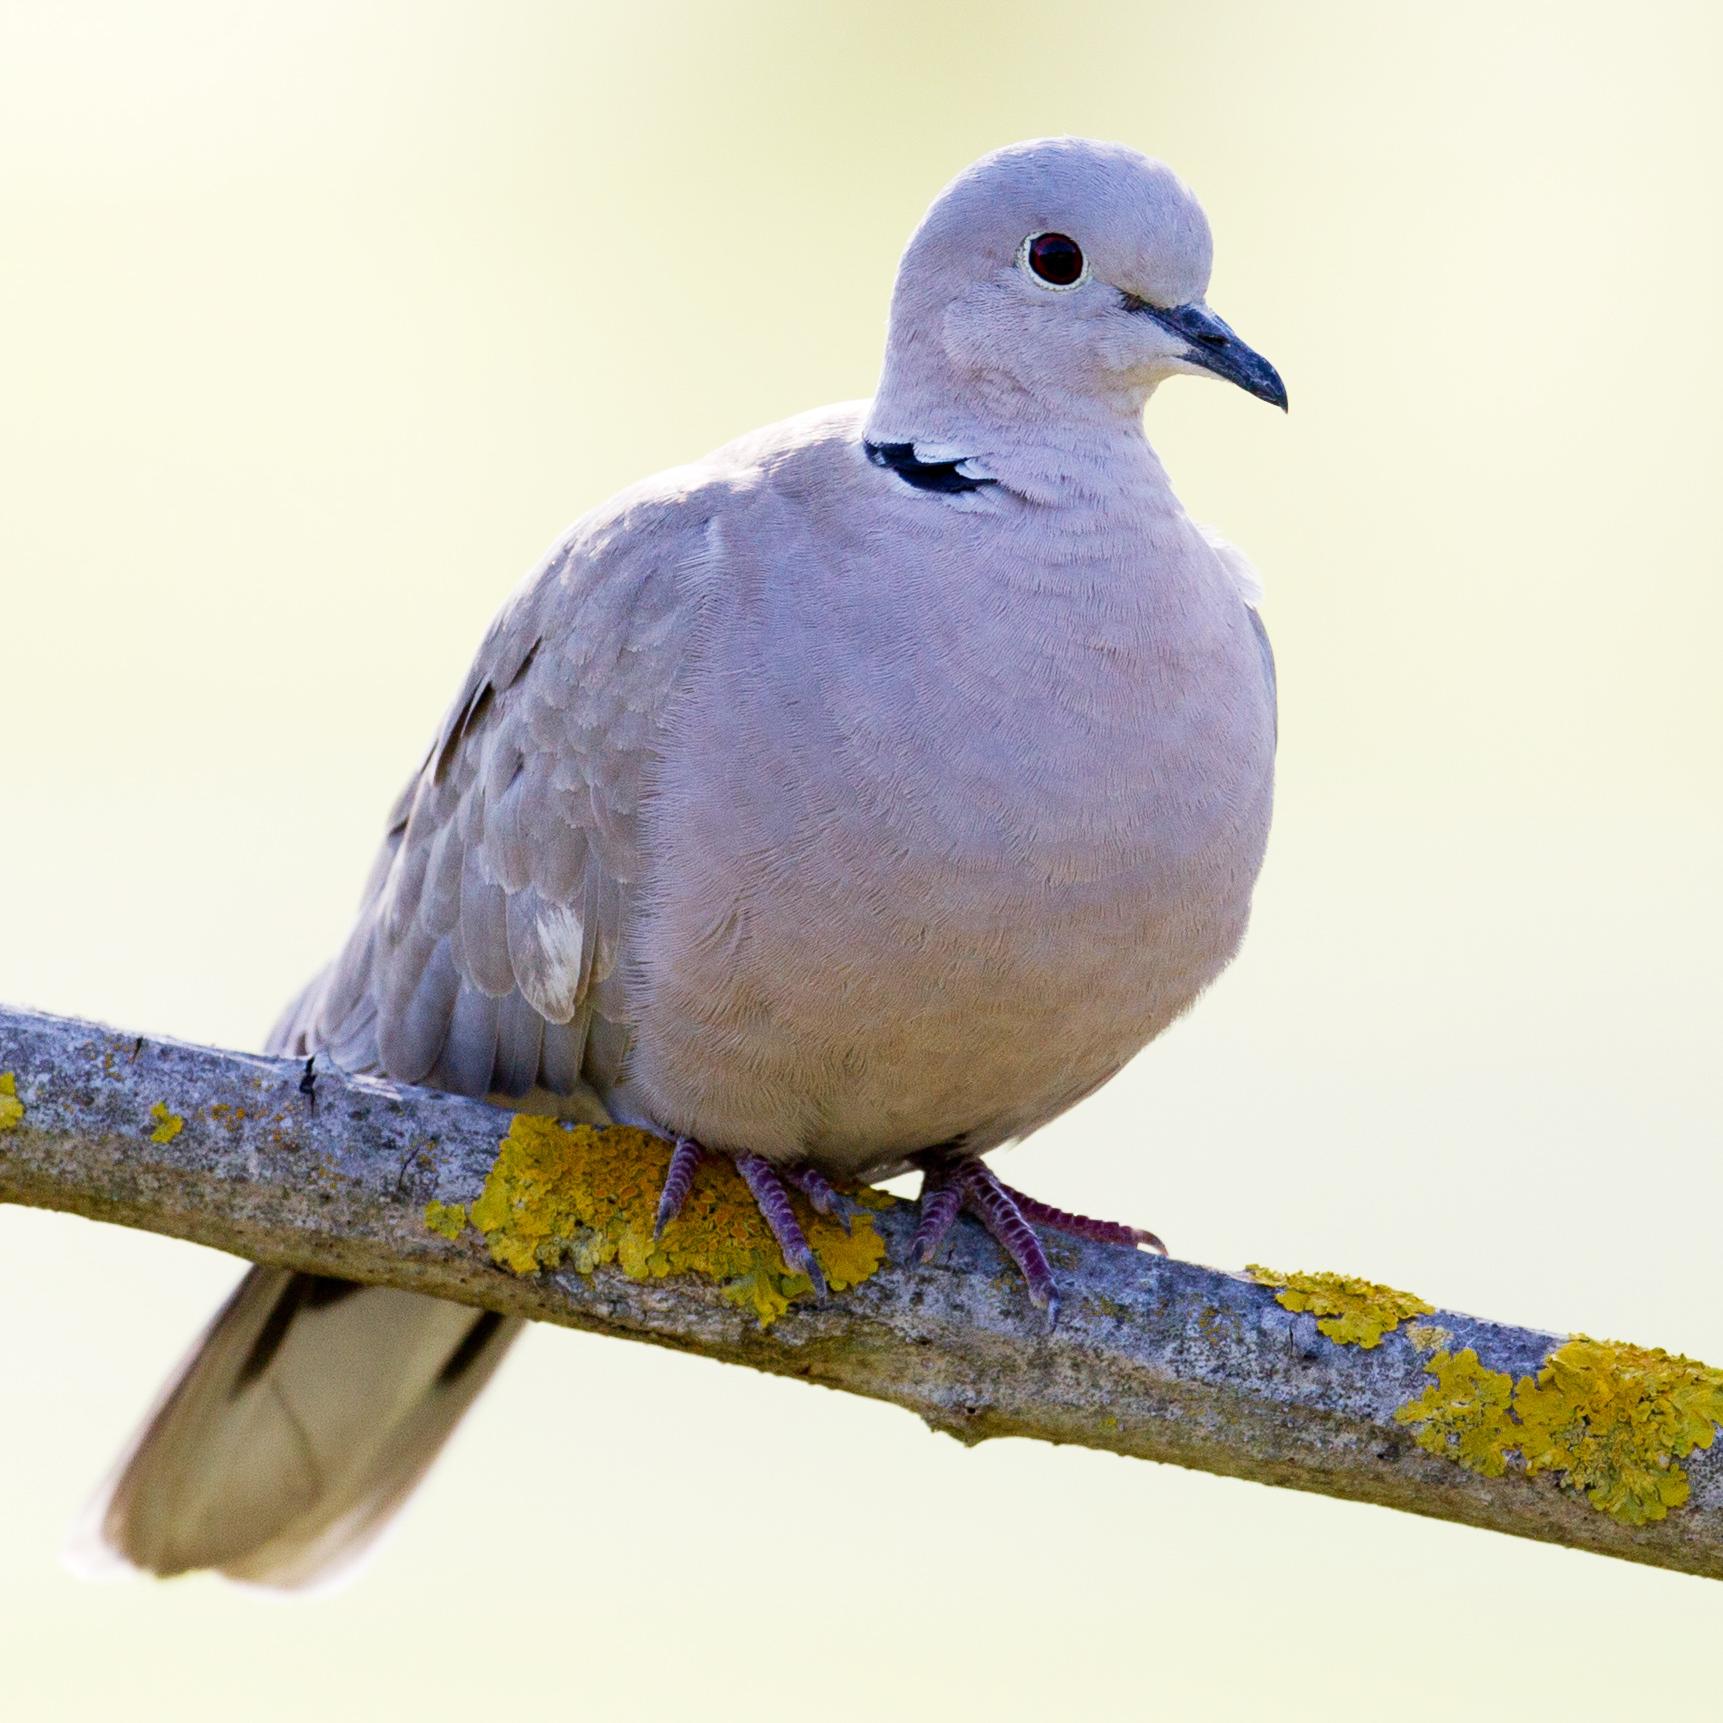 Eurasian Collared-Dove Marcel Holyoak/Flickr Creative Commons